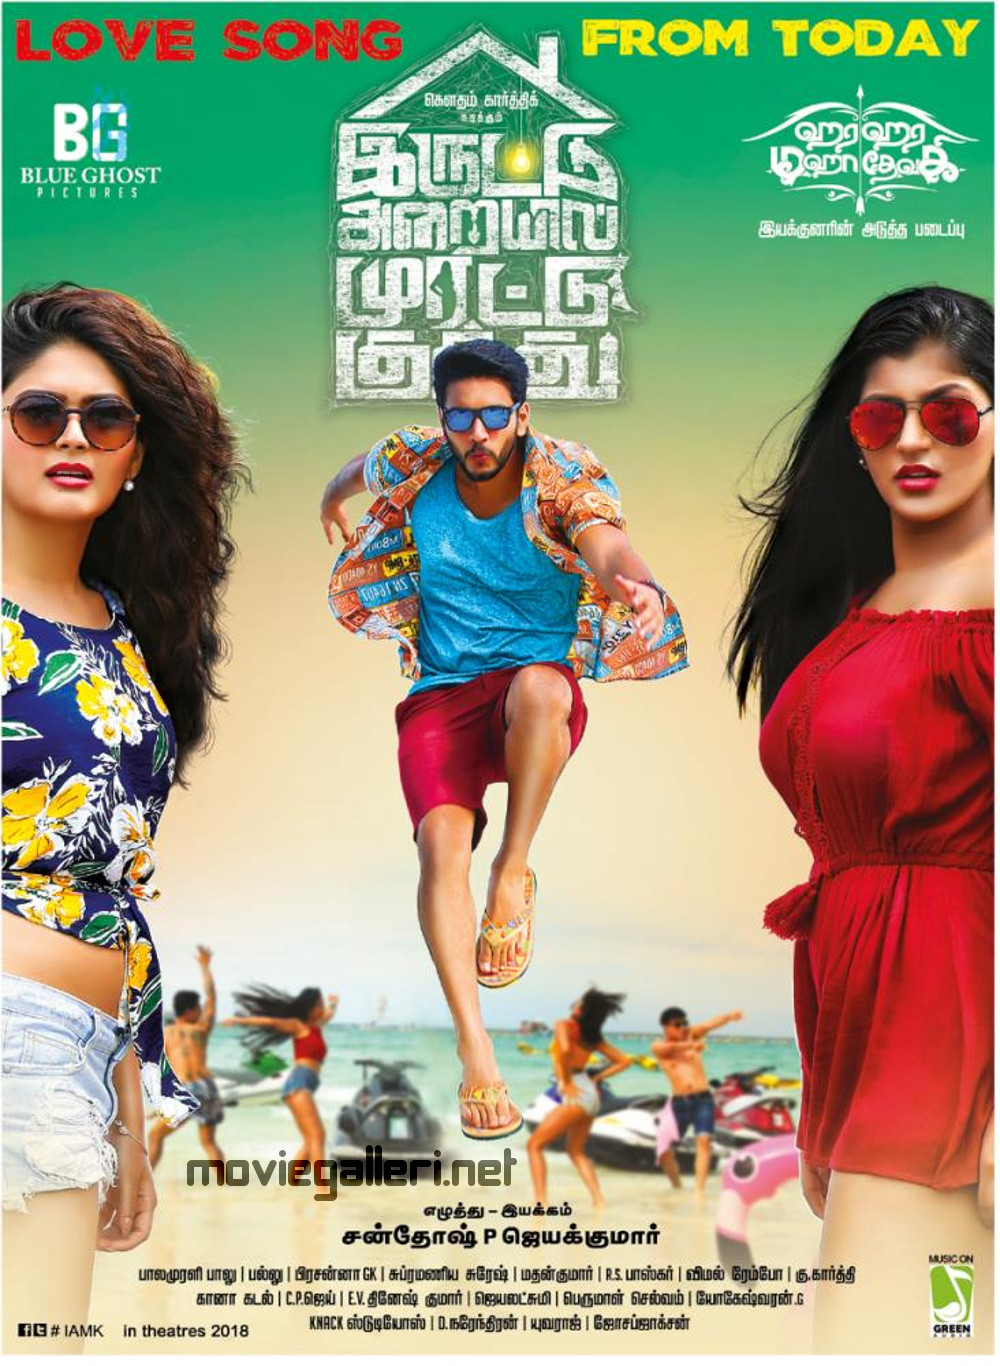 Iruttu Arayil Murattu Kuthu Love Song From Today Posters New Movie